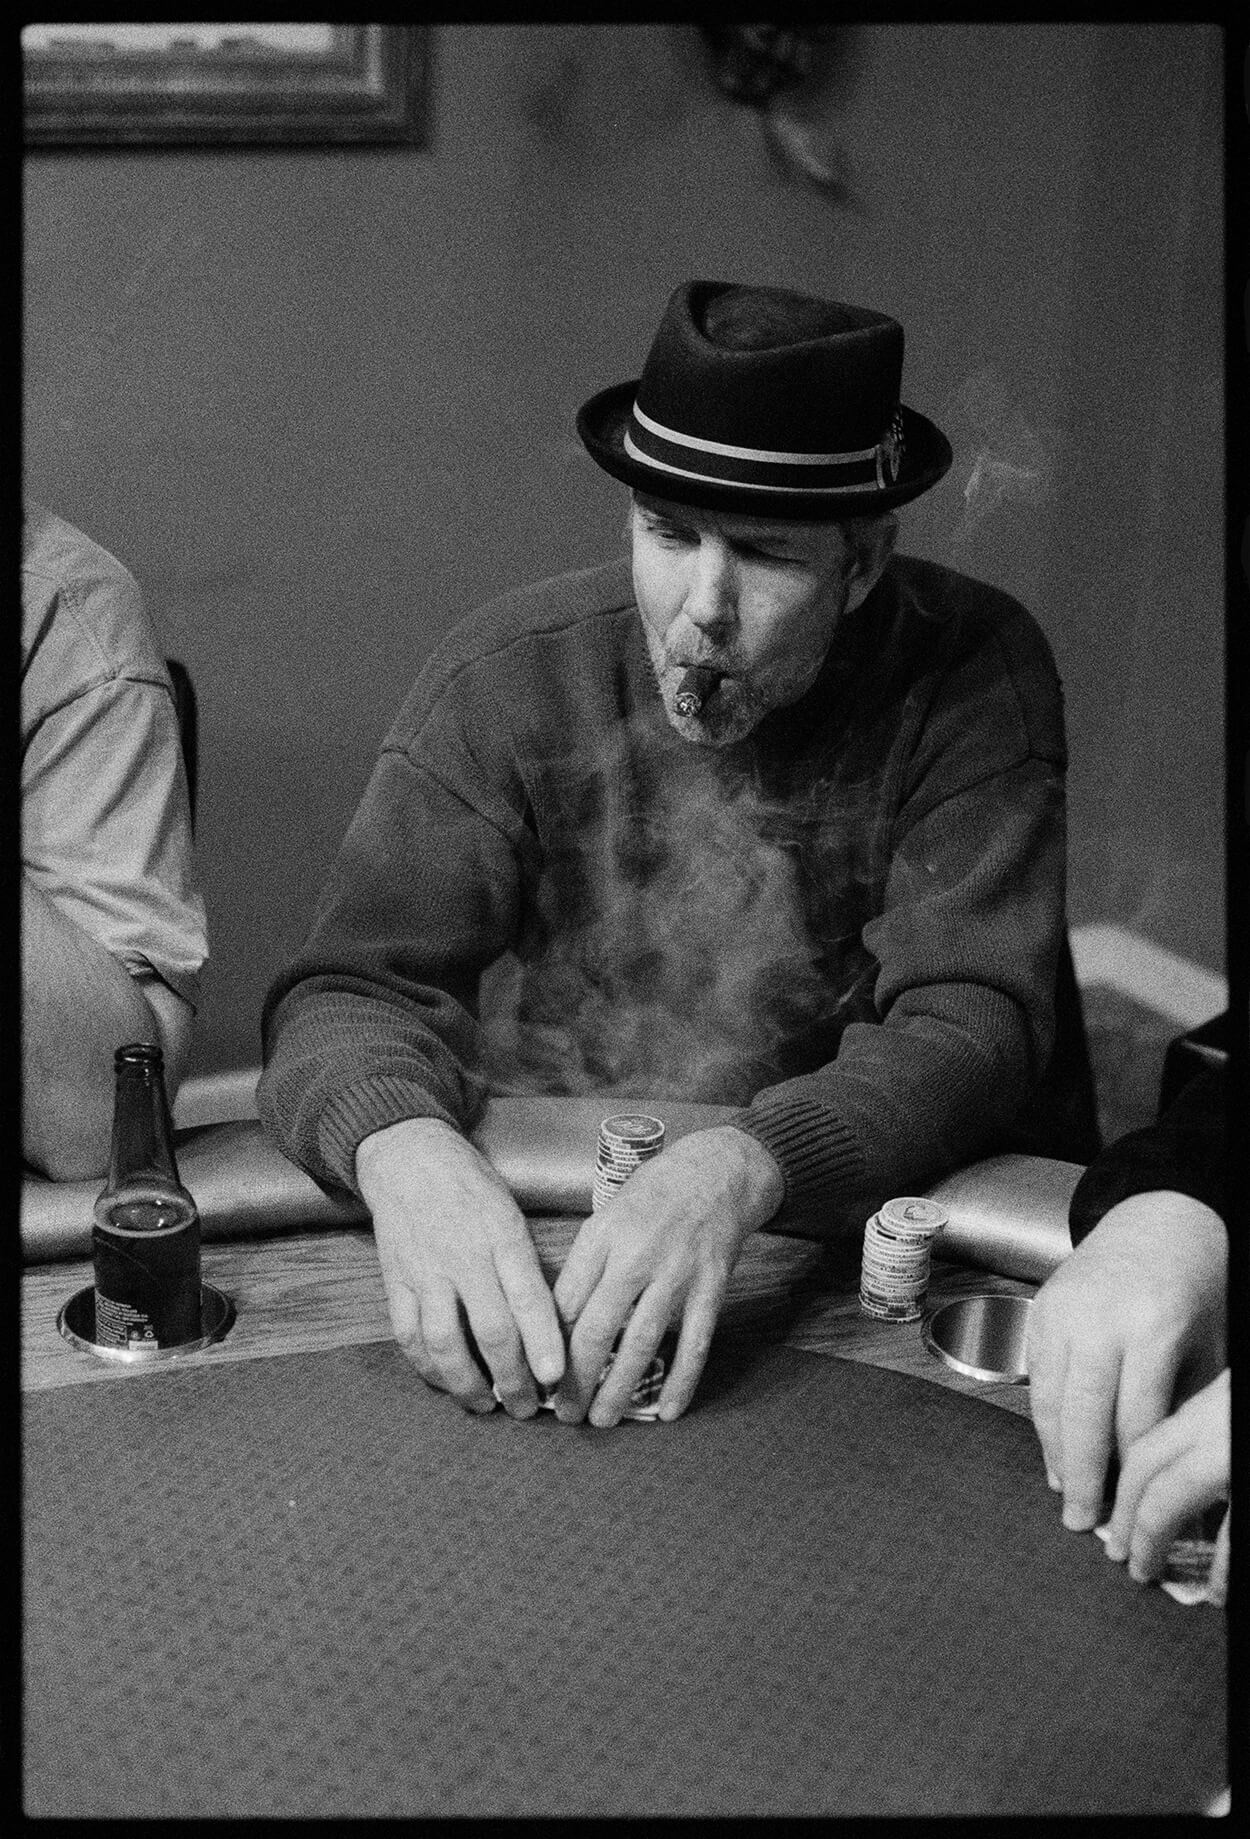 Scotty / Poker Hand - Off The Strip - Hunter Barnes Photography